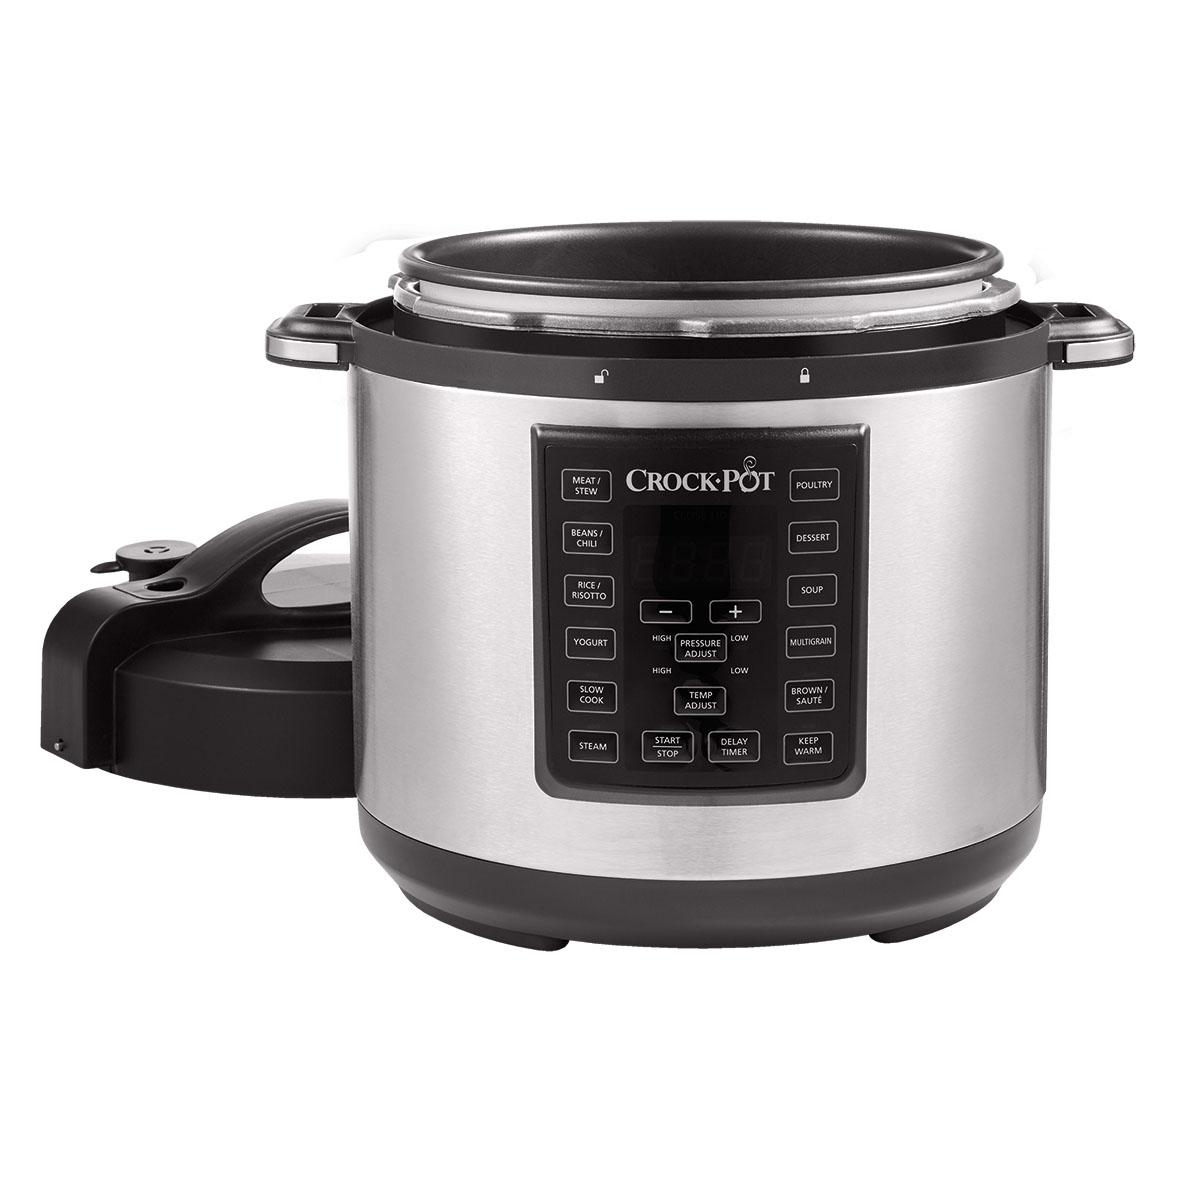 Crock-Pot® Express Crock Multi-Cooker - SCCPPC600-V1-033 ...